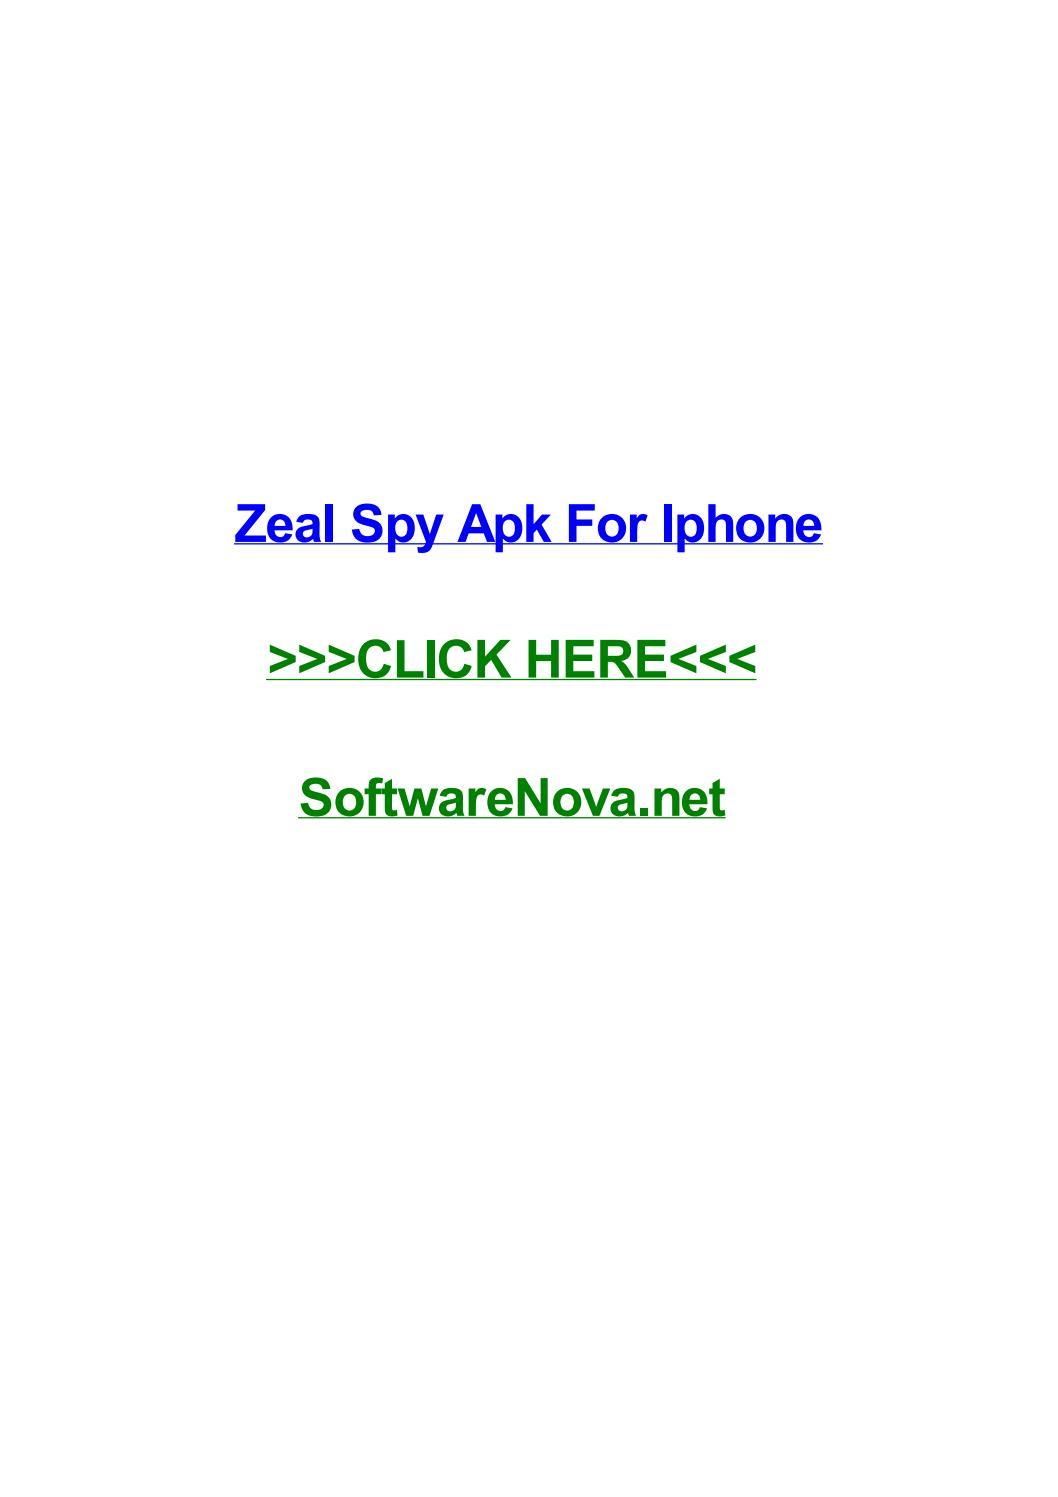 SPY TÉLÉCHARGER IPHONE ZEAL